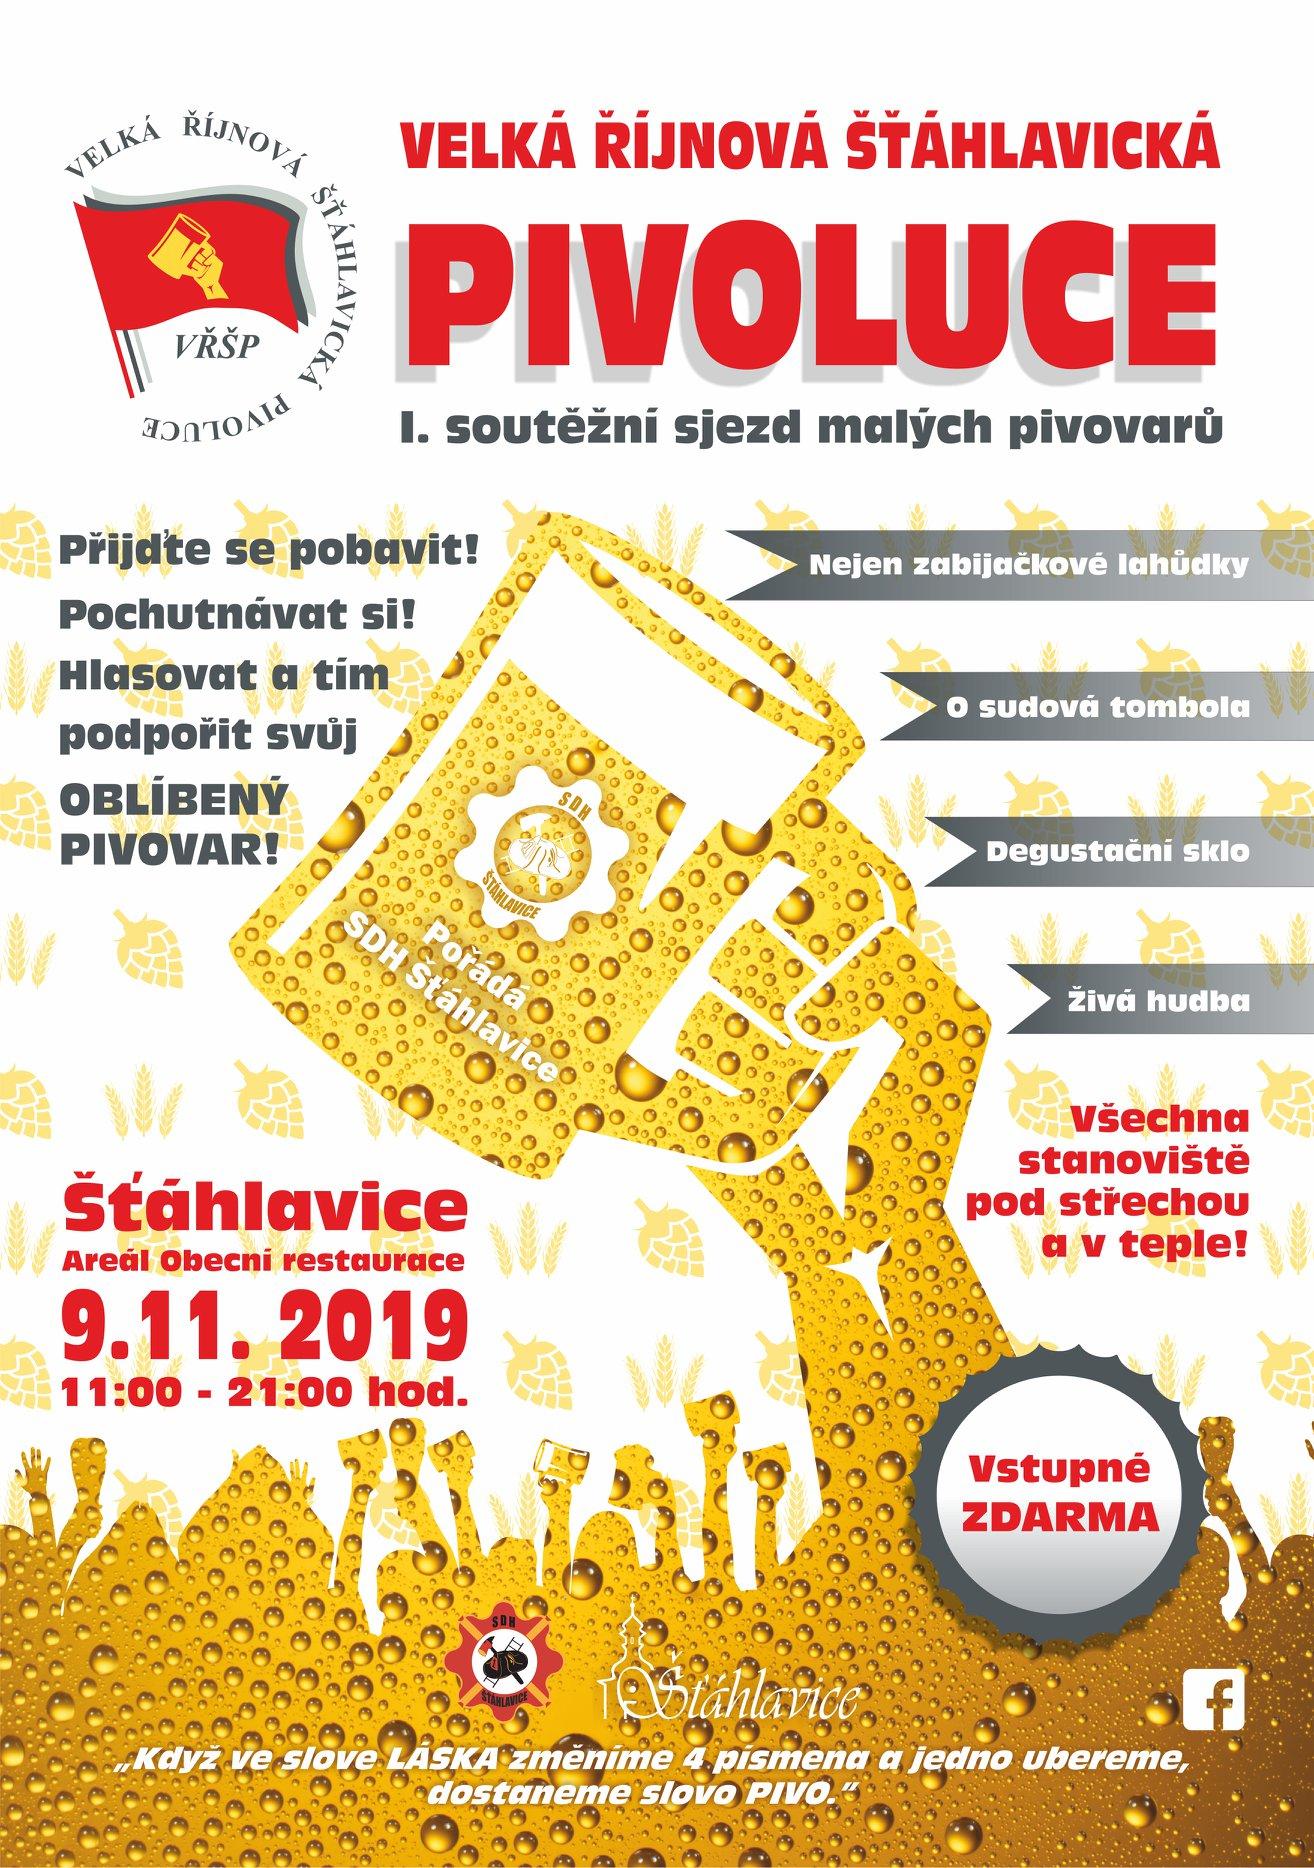 pivovari-pivovary-pivni-akce-velka-rijnova-stahlavicka-pivoluce-2019